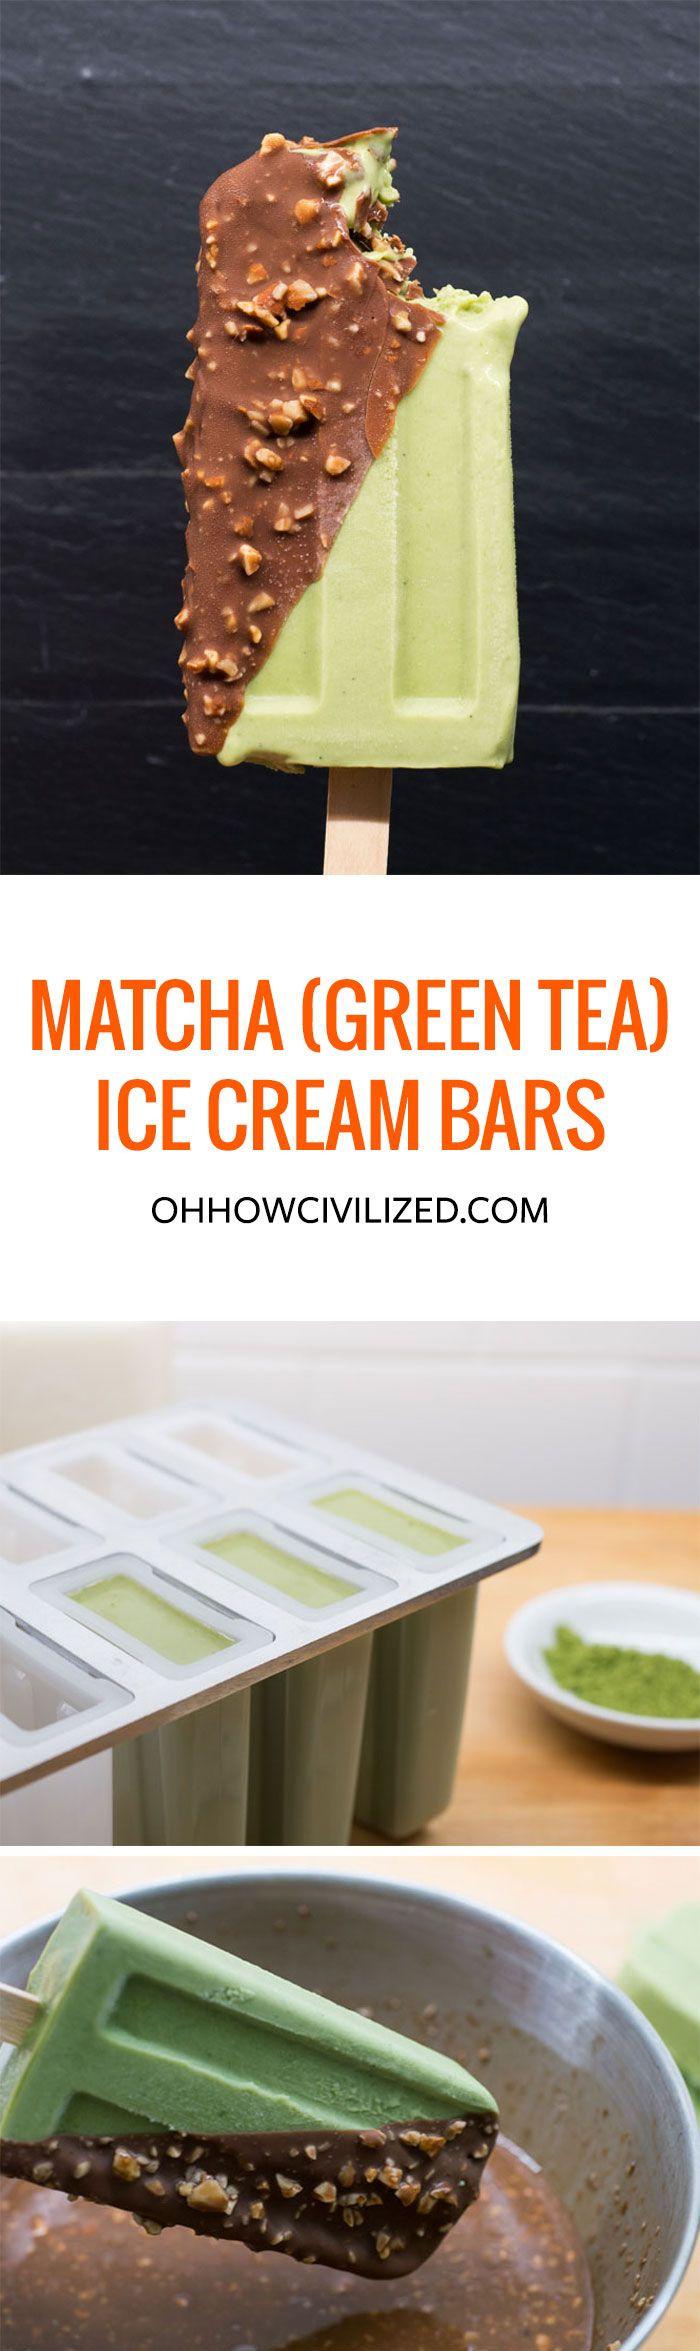 MATCHA (GREEN TEA) ICE CREAM BARS WITH MAGIC CHOCOLATE AND TOASTED ALMOND SHELL